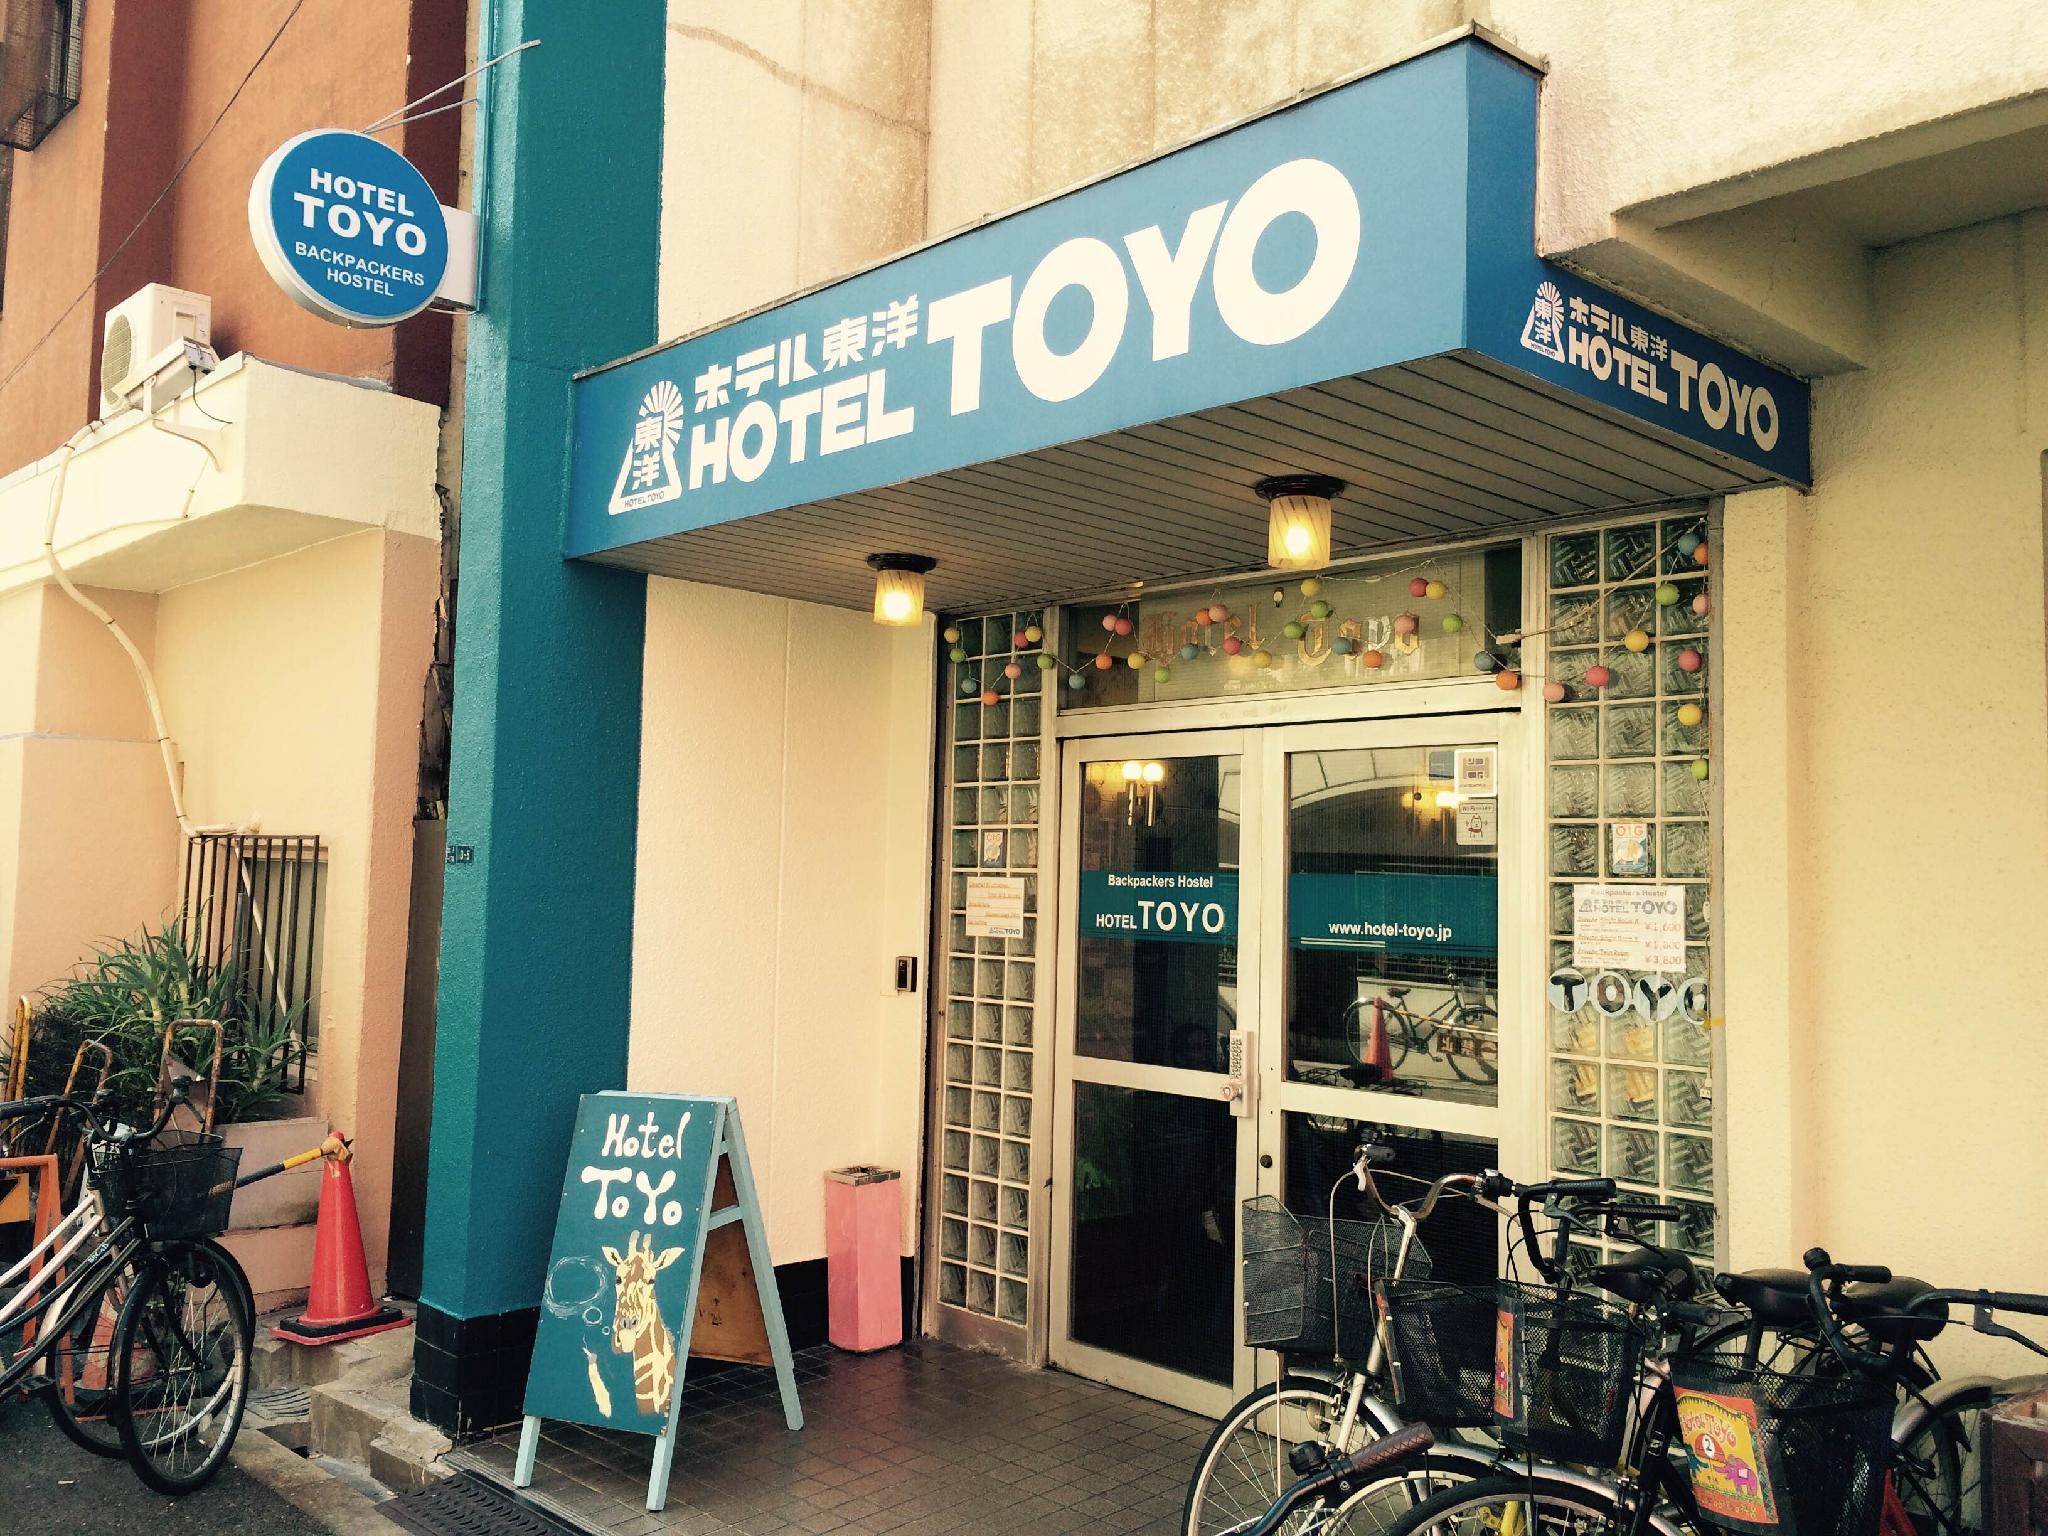 Backpackers Hotel Toyo